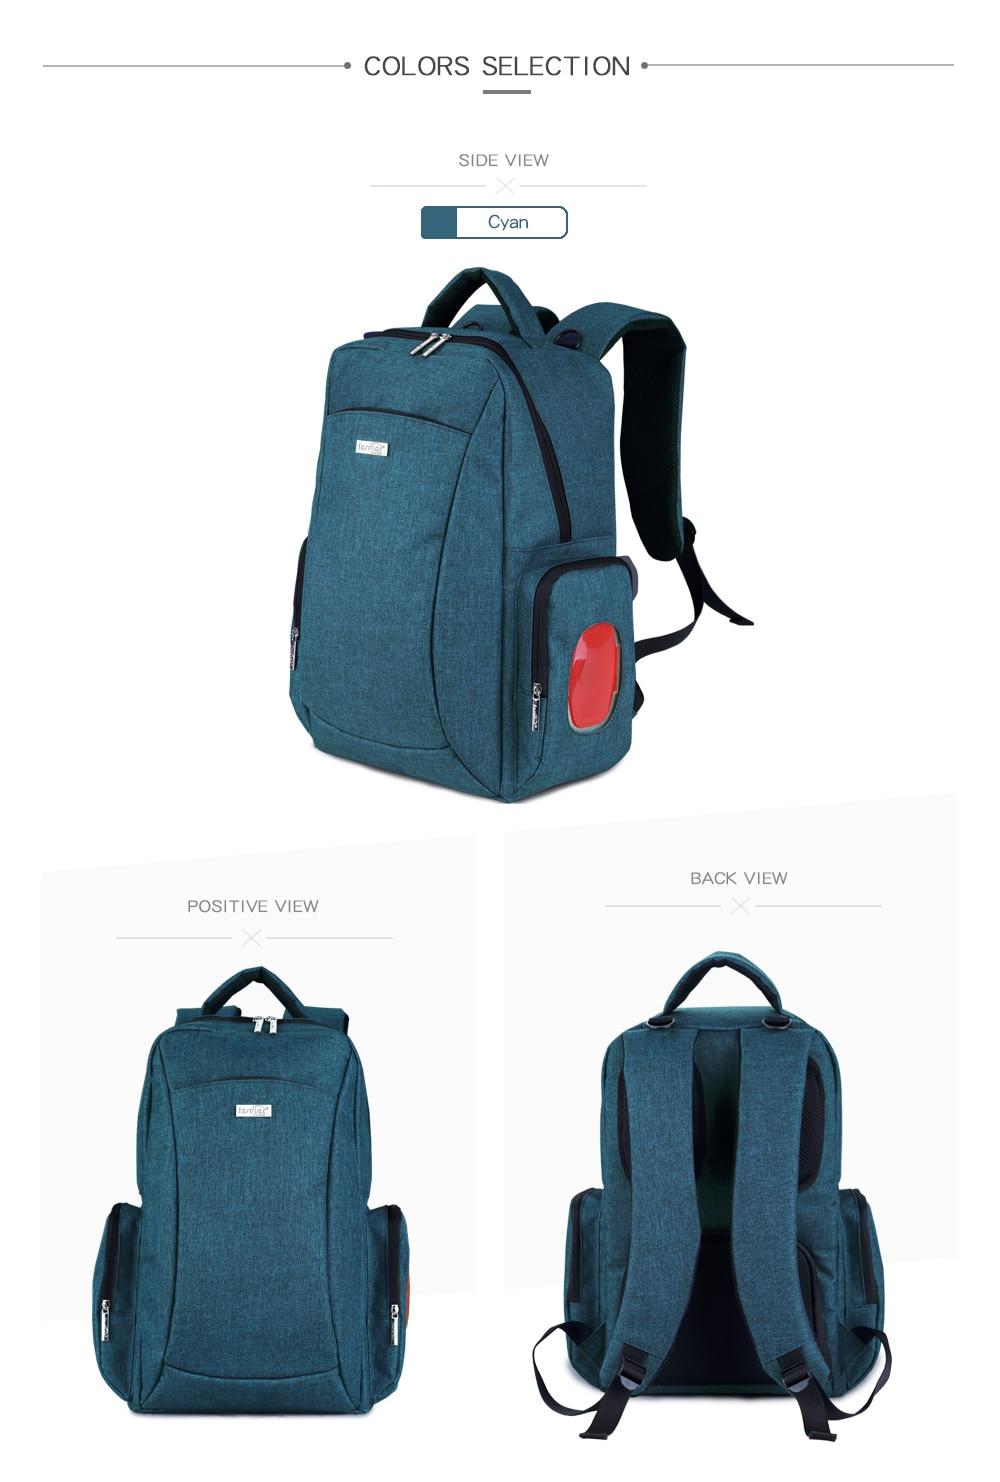 baby diaper backpack10026 (19)